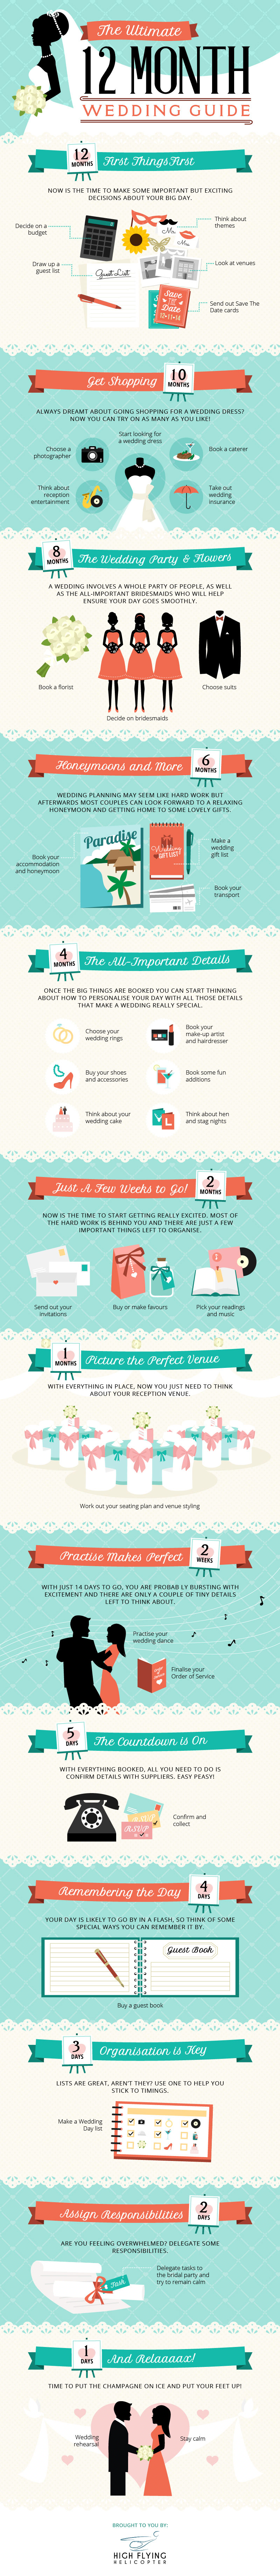 Ultimate-12-Month-Wedding-Guide-v2